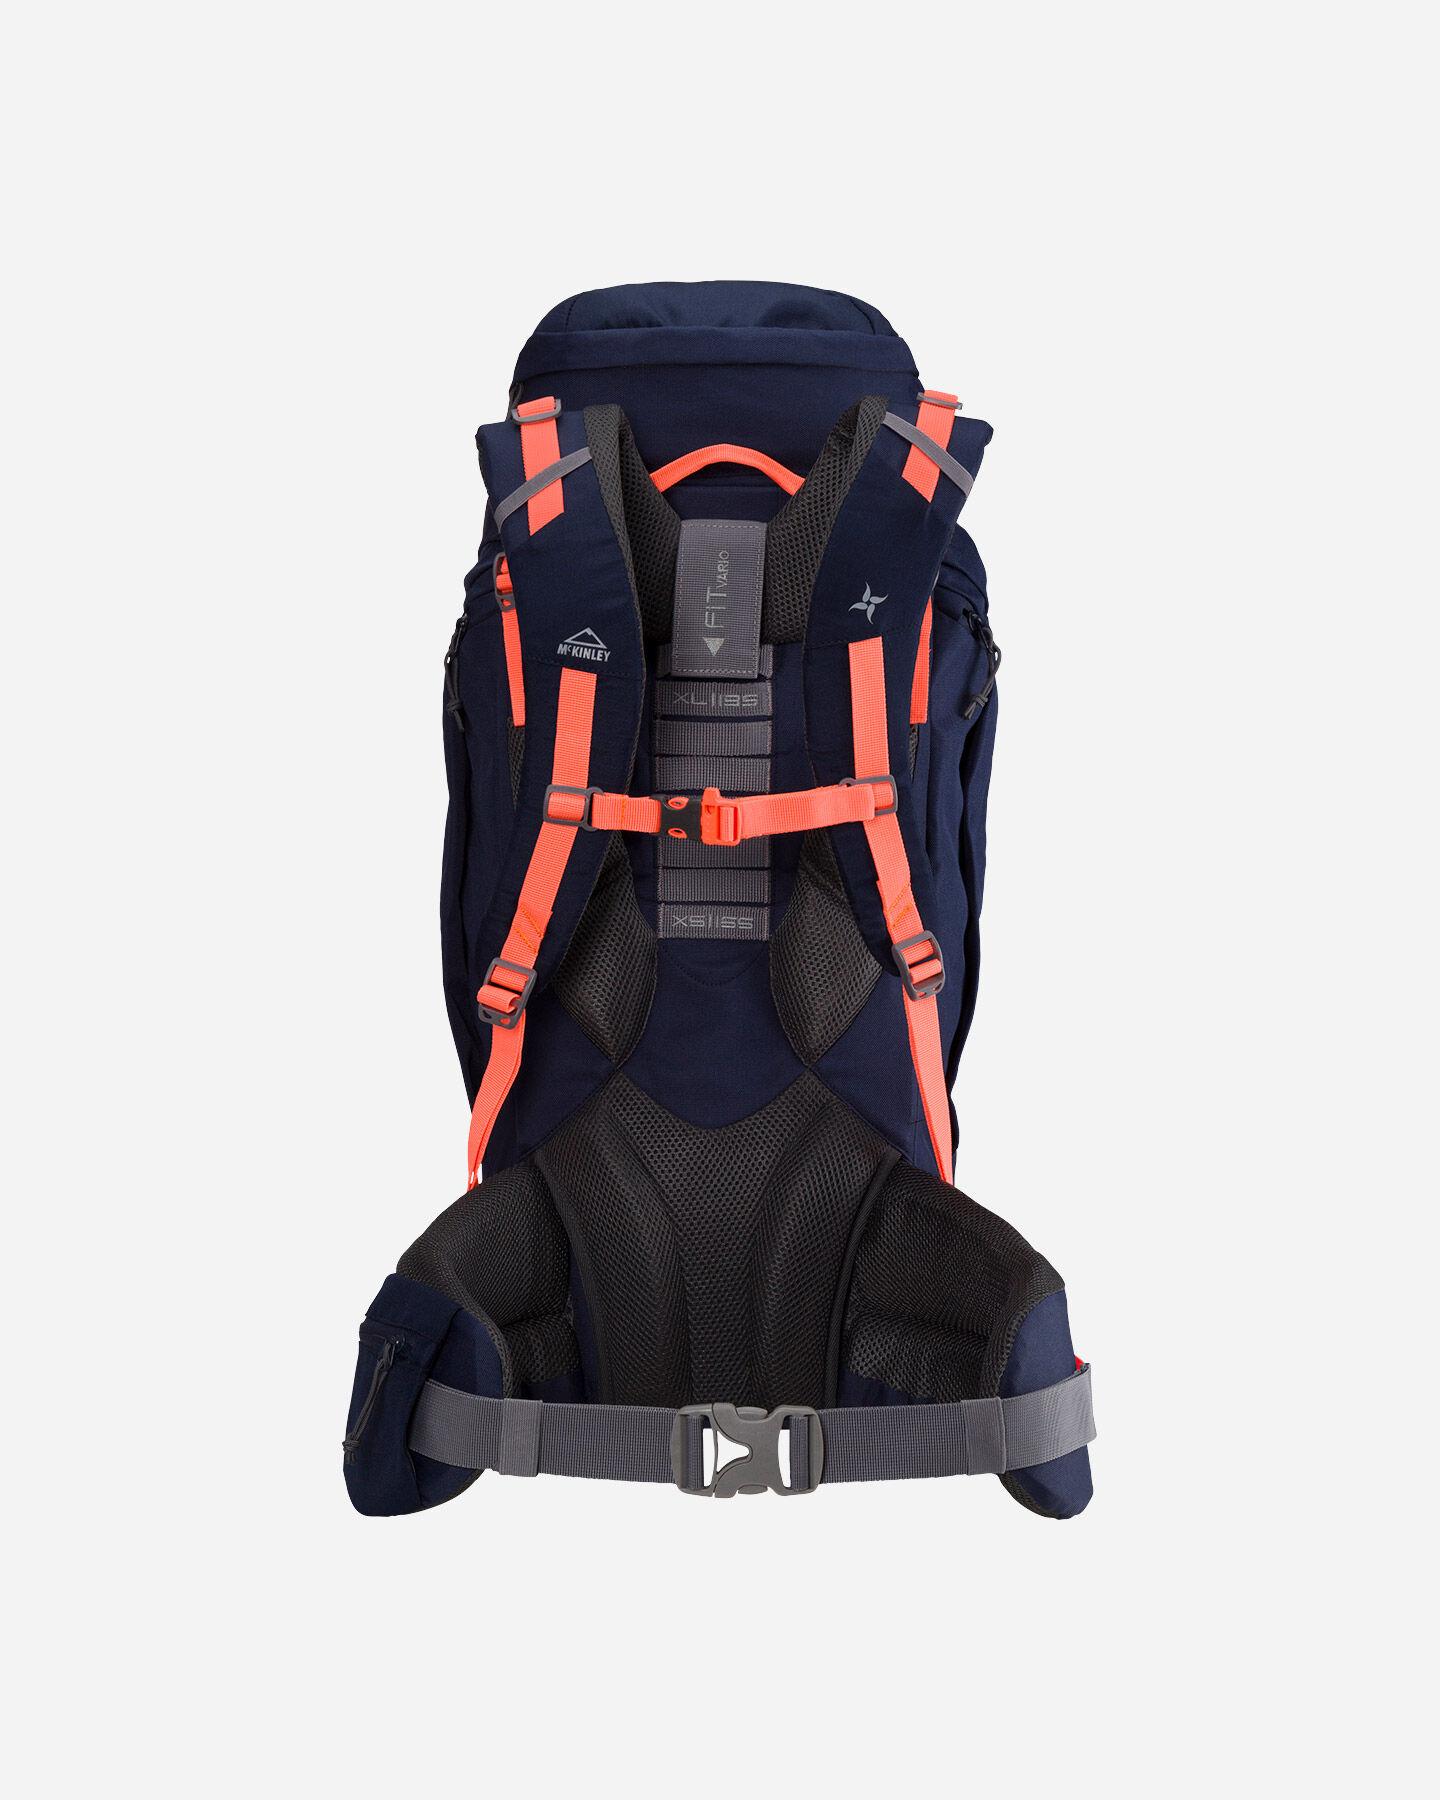 Zaino trekking MCKINLEY MAKE 50+10 RC S2001466|901|50 scatto 1